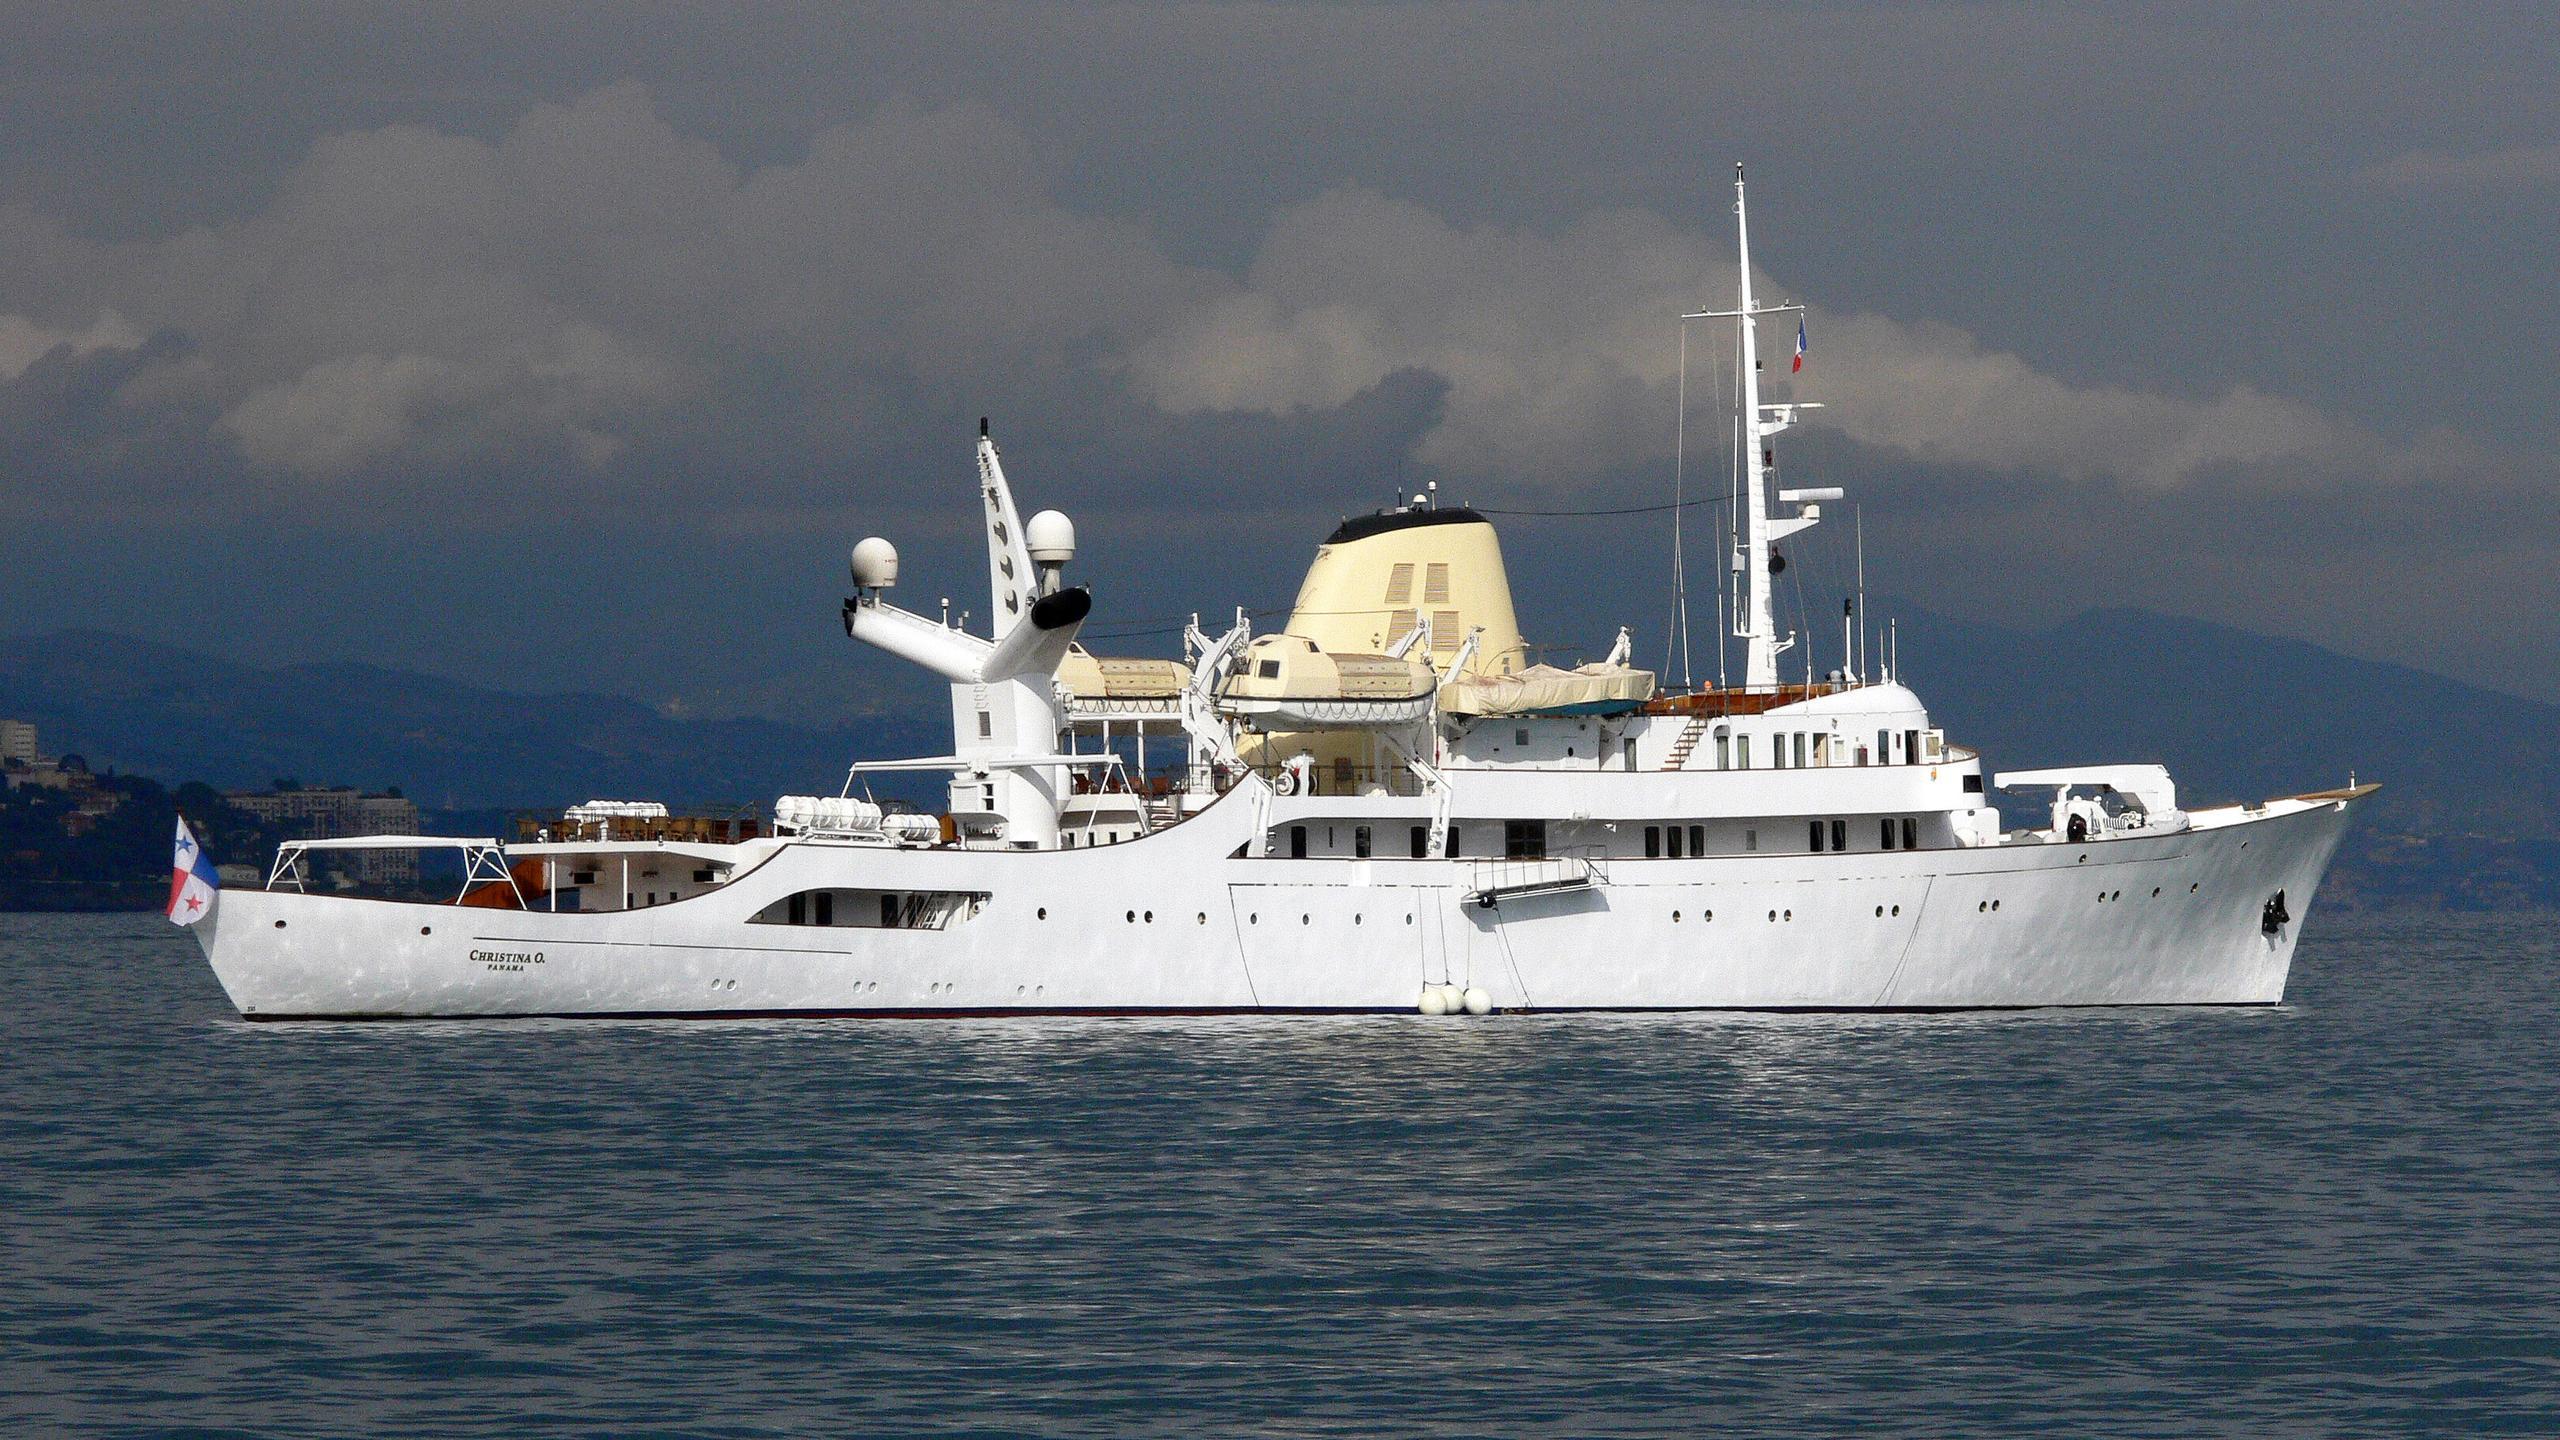 christina-motor-yacht-ferretti-881-2005-27m-anchored-profile